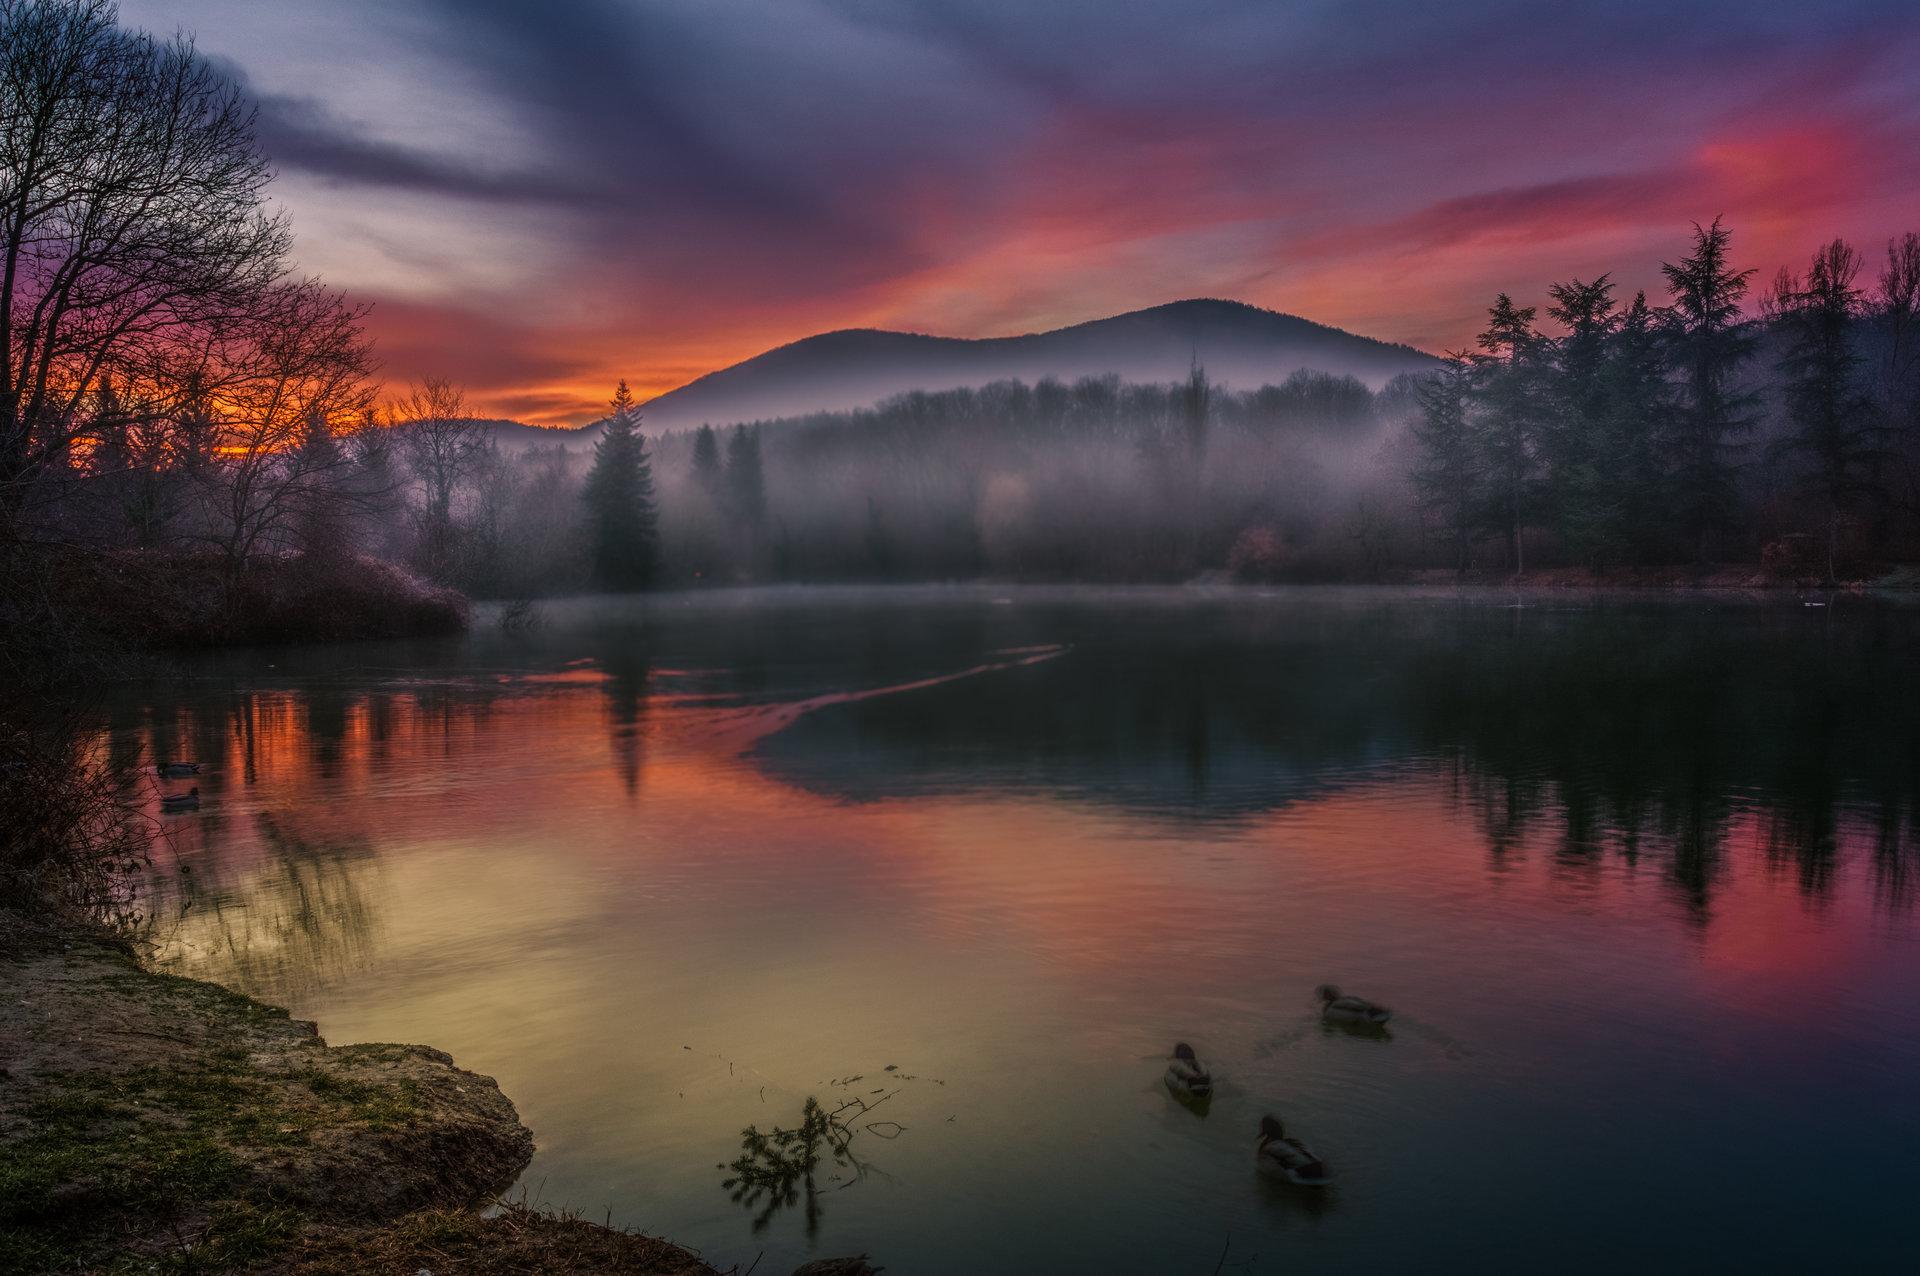 Сутрешни минути.. | Author Даниел Пейков - MyPyH4oo | PHOTO FORUM